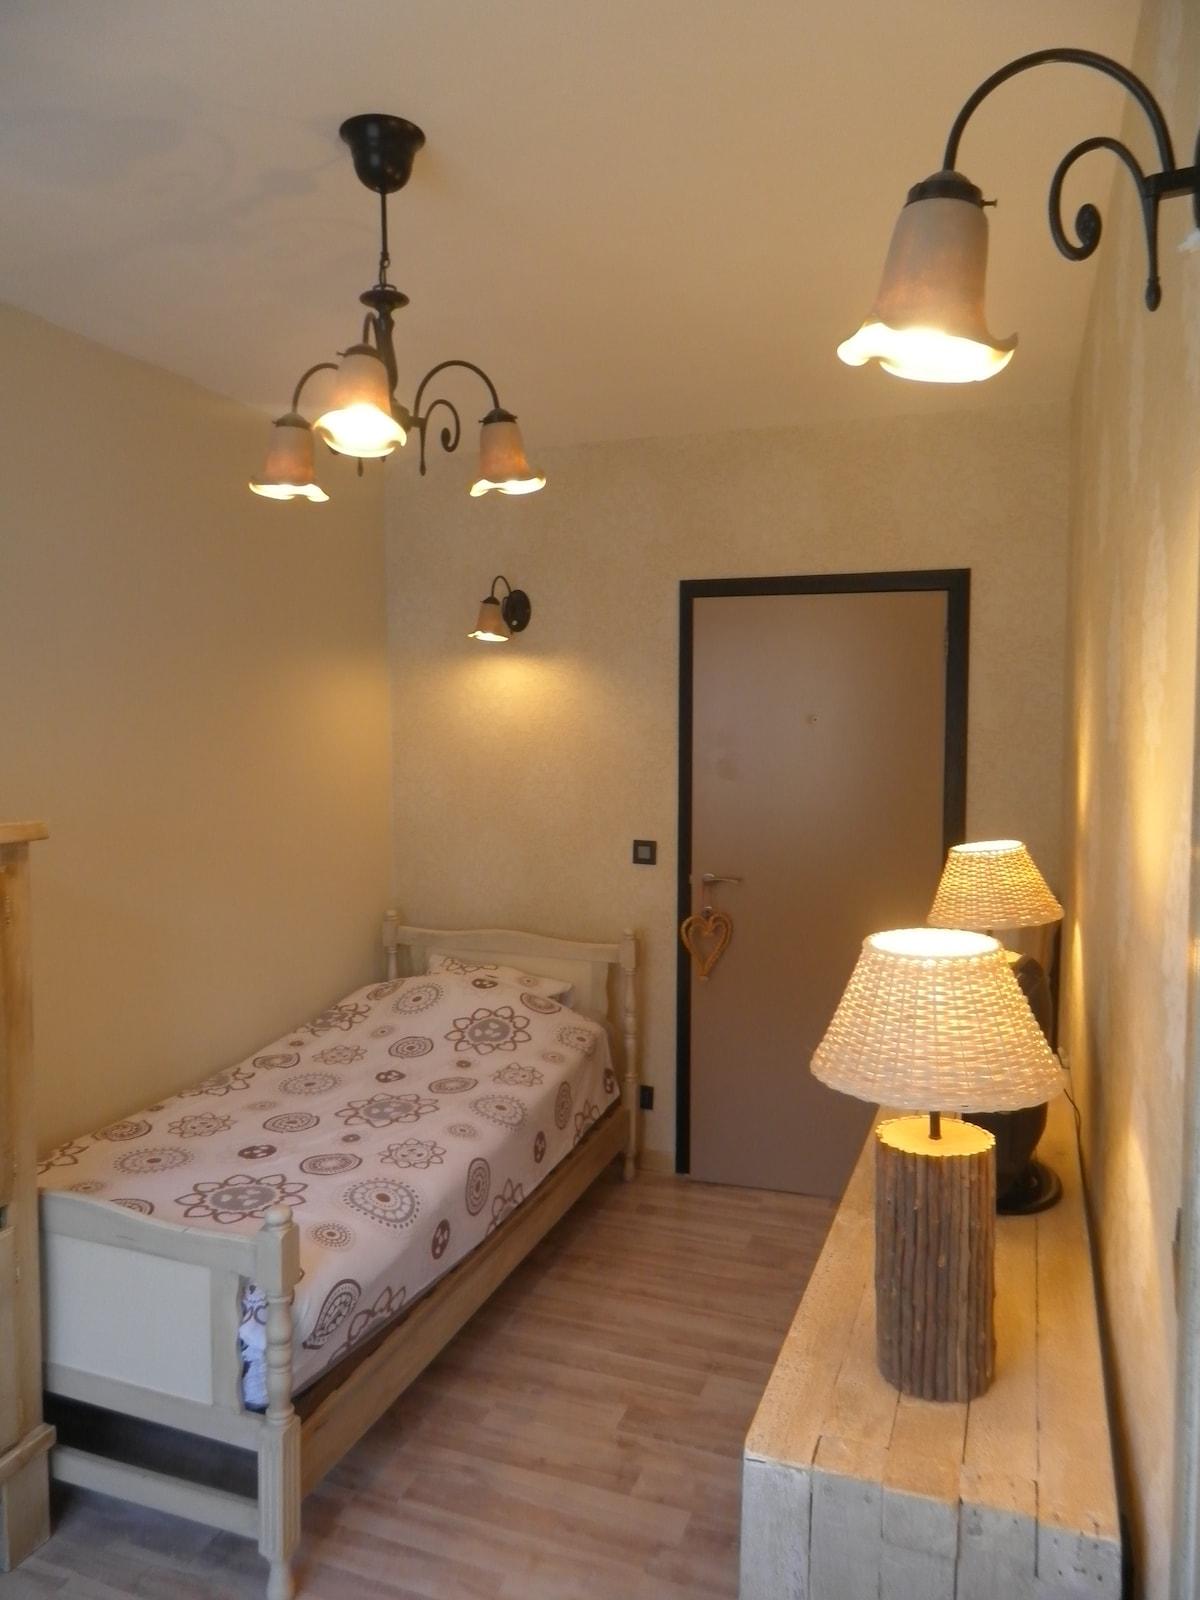 Single room with wifi